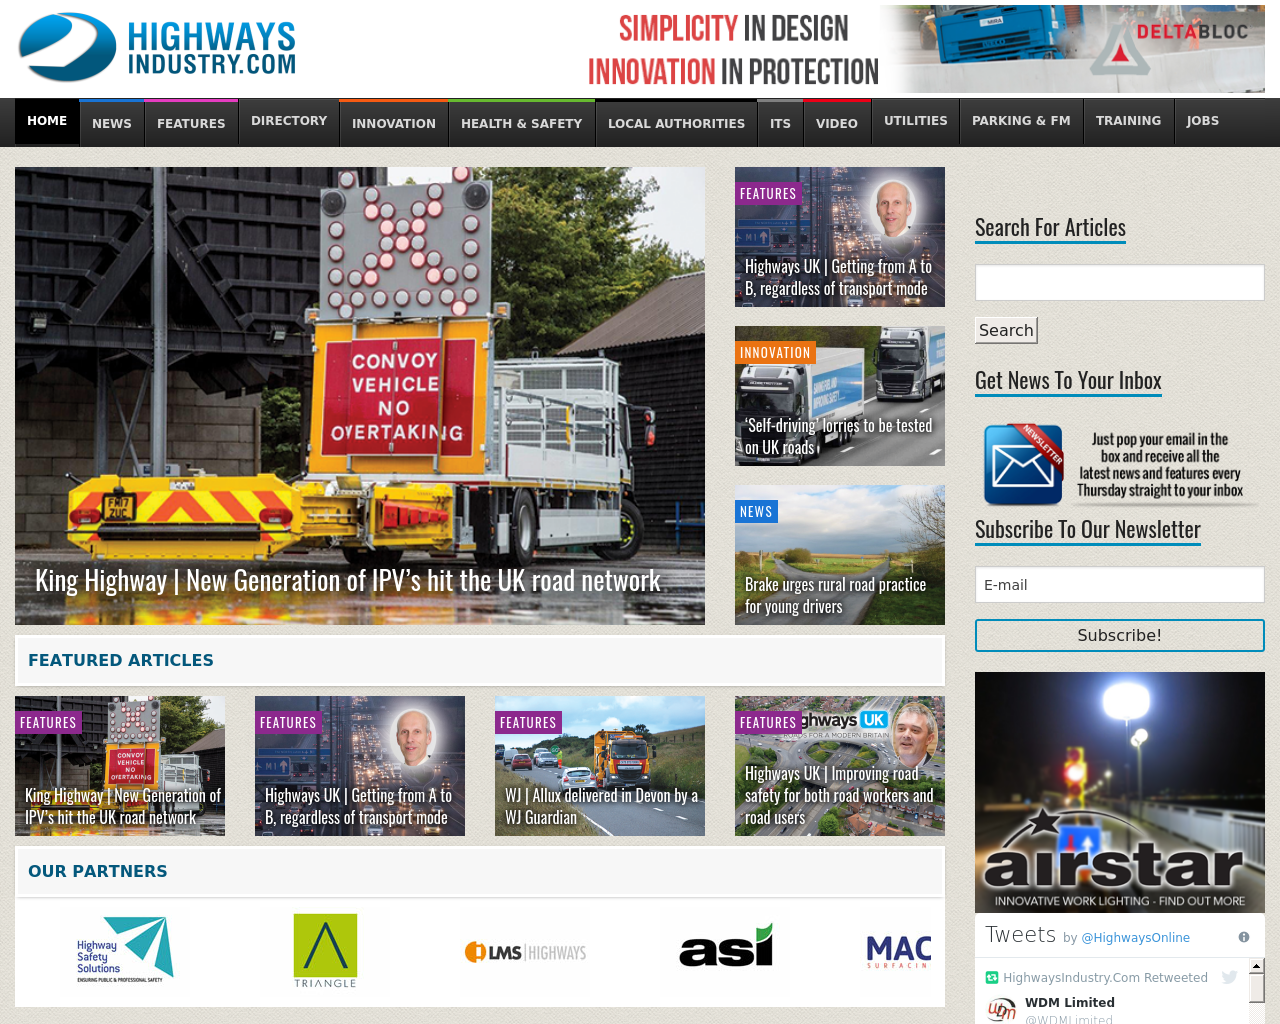 HighwaysIndustry.com-Advertising-Reviews-Pricing